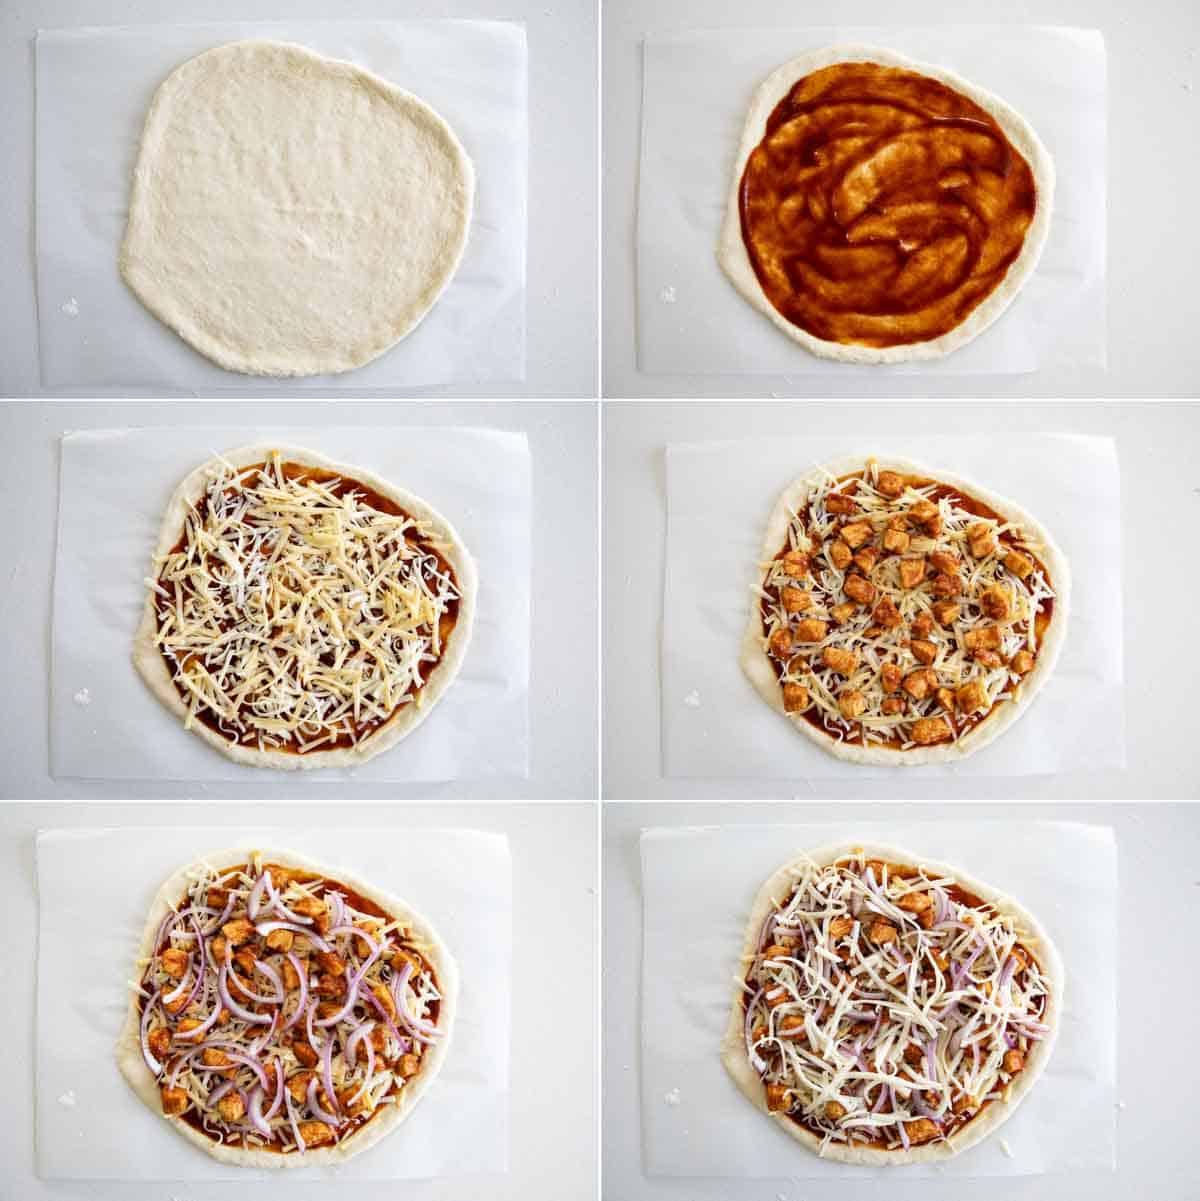 steps to make bbq chicken pizza